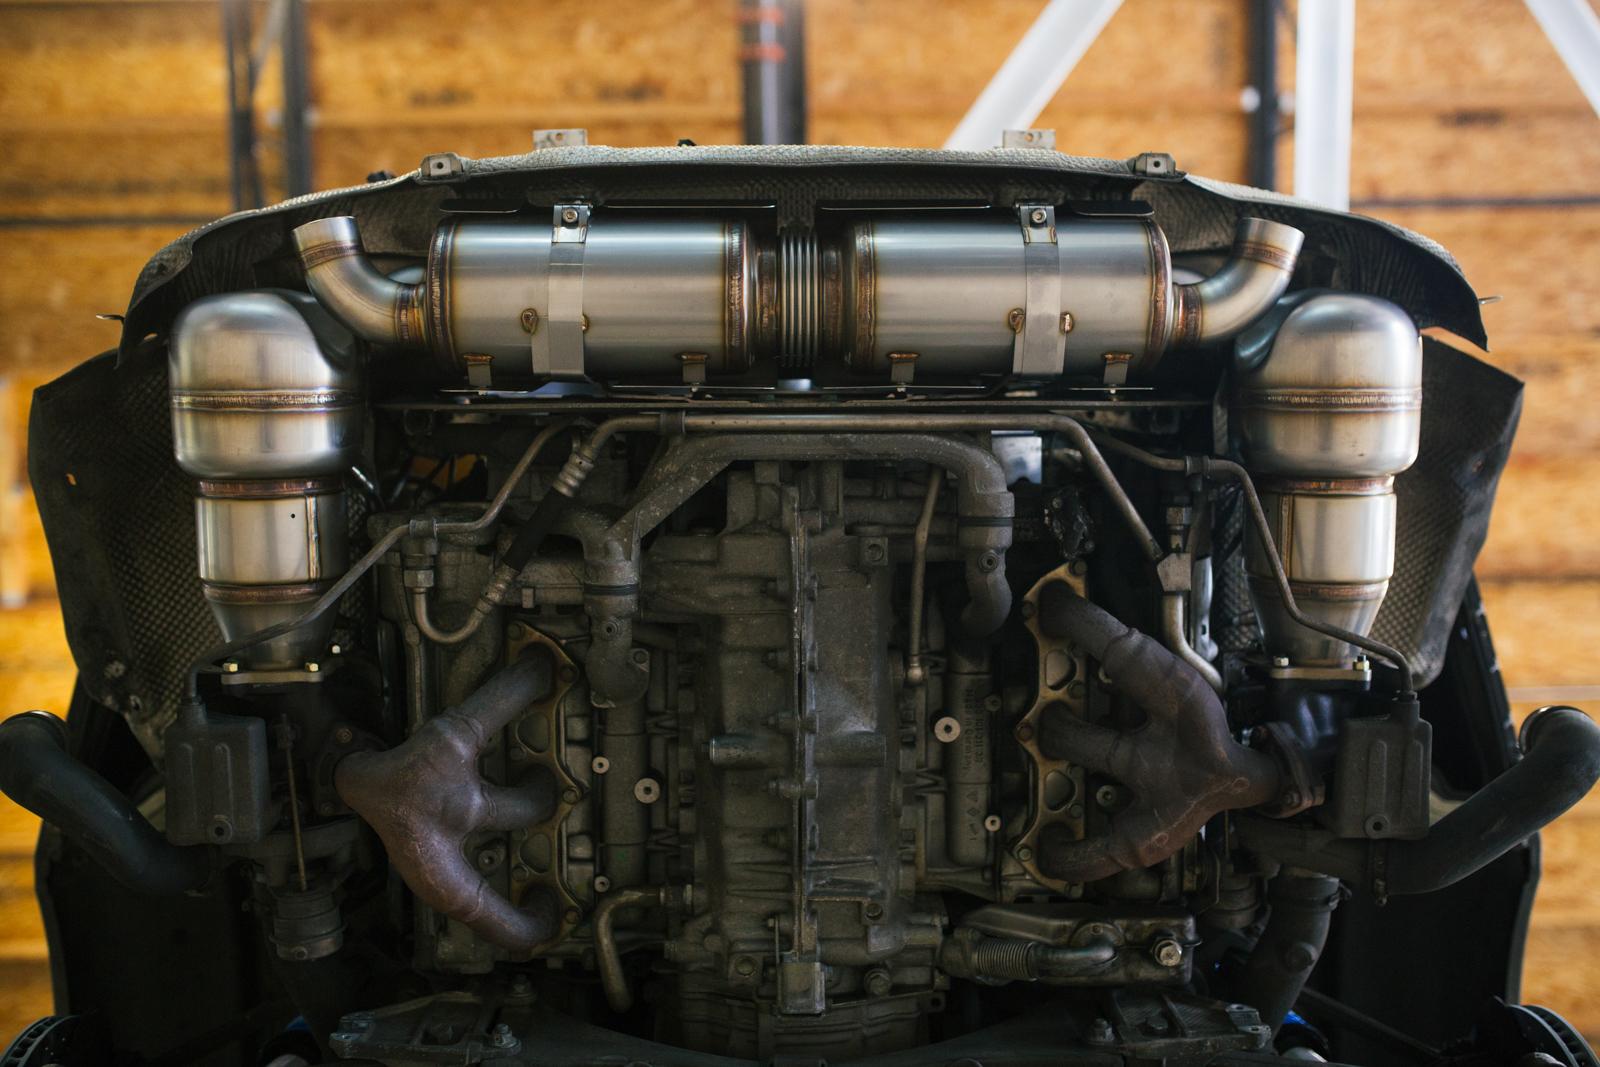 996 Turbo - The Works - January 10, 2018